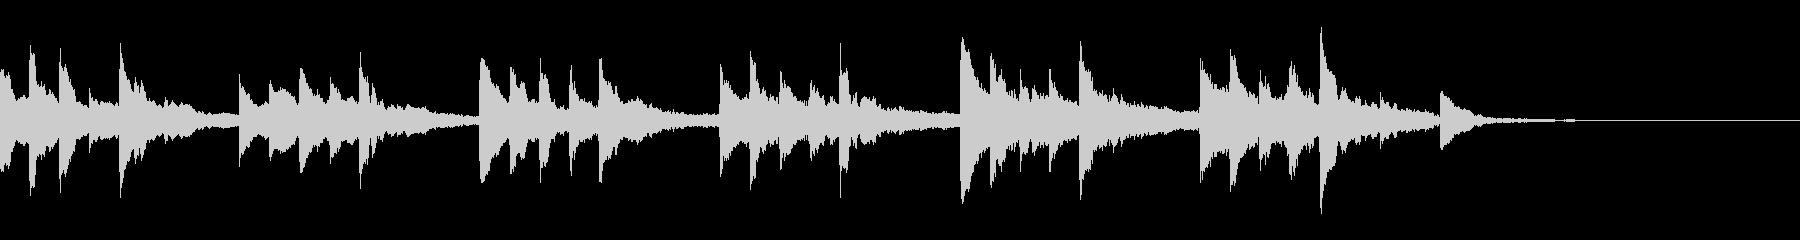 DeepBlueKURAGE30秒ピアノの未再生の波形